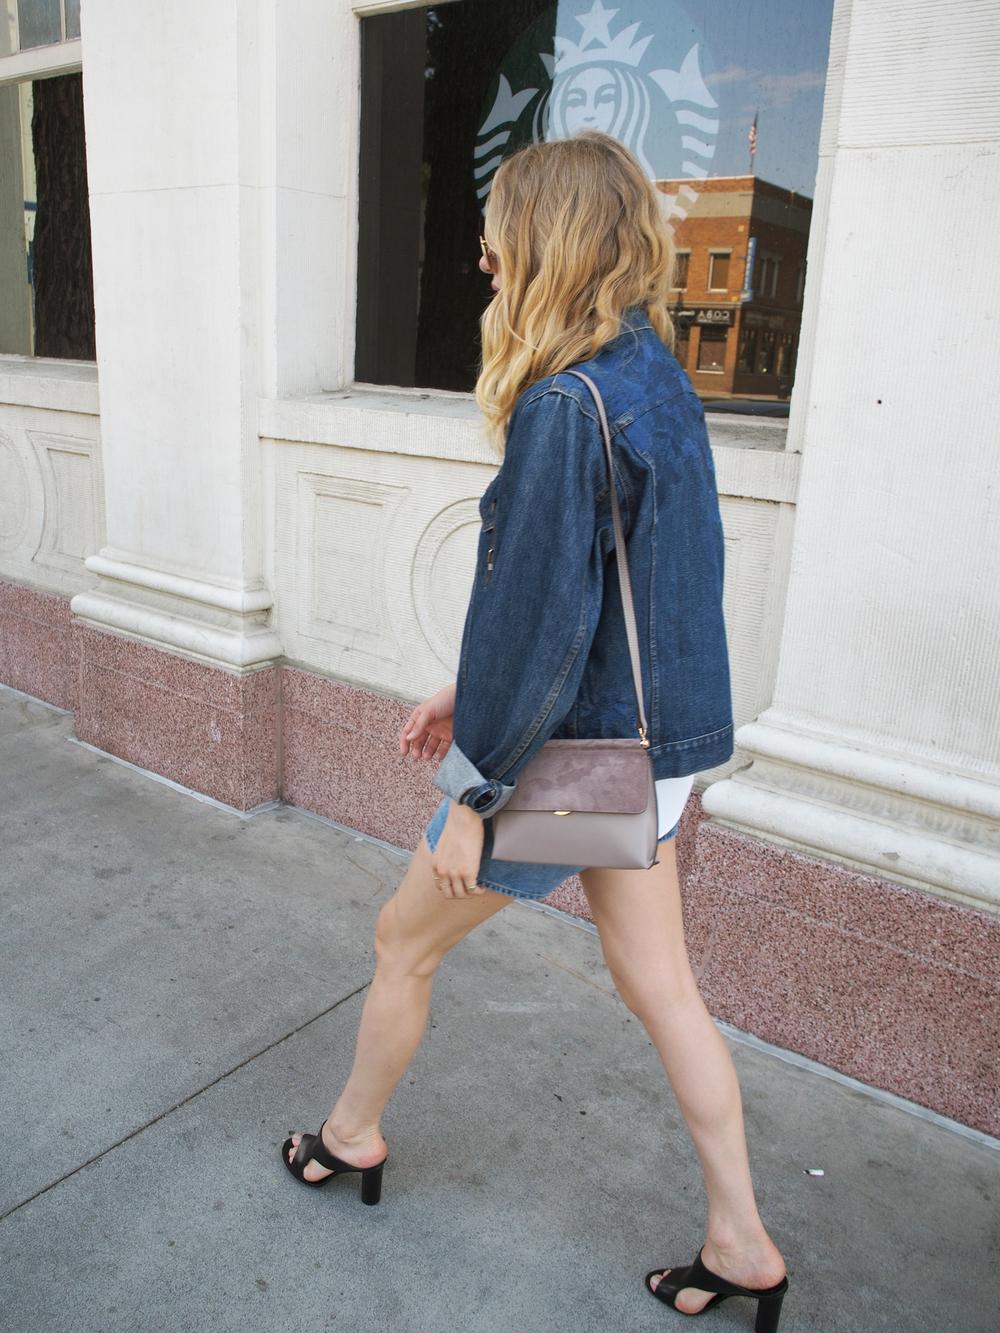 Levi's Denim M.i.h Jeans HiEleven Purse Fifteen Twenty Casual Street Look x Taylr Anne